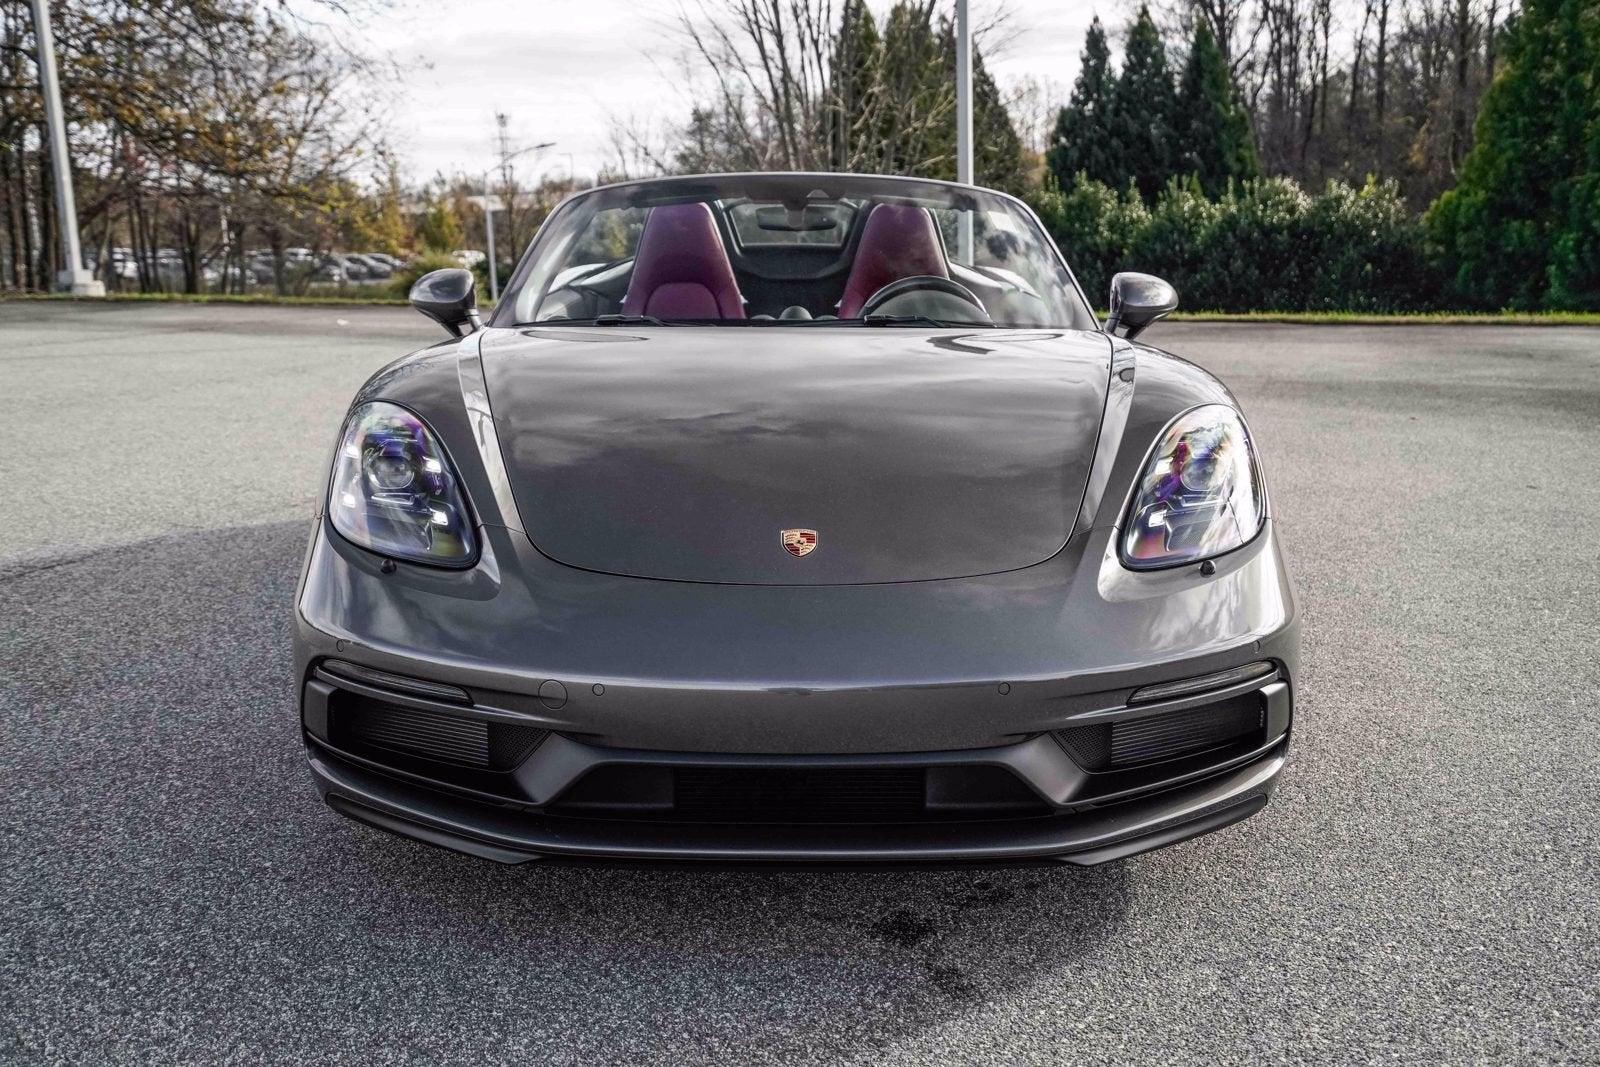 2021 Porsche 718 Boxster Gts 4 0 Greensboro Nc Raleigh Winston Salem Durham North Carolina Wp0cd2a82ms232157